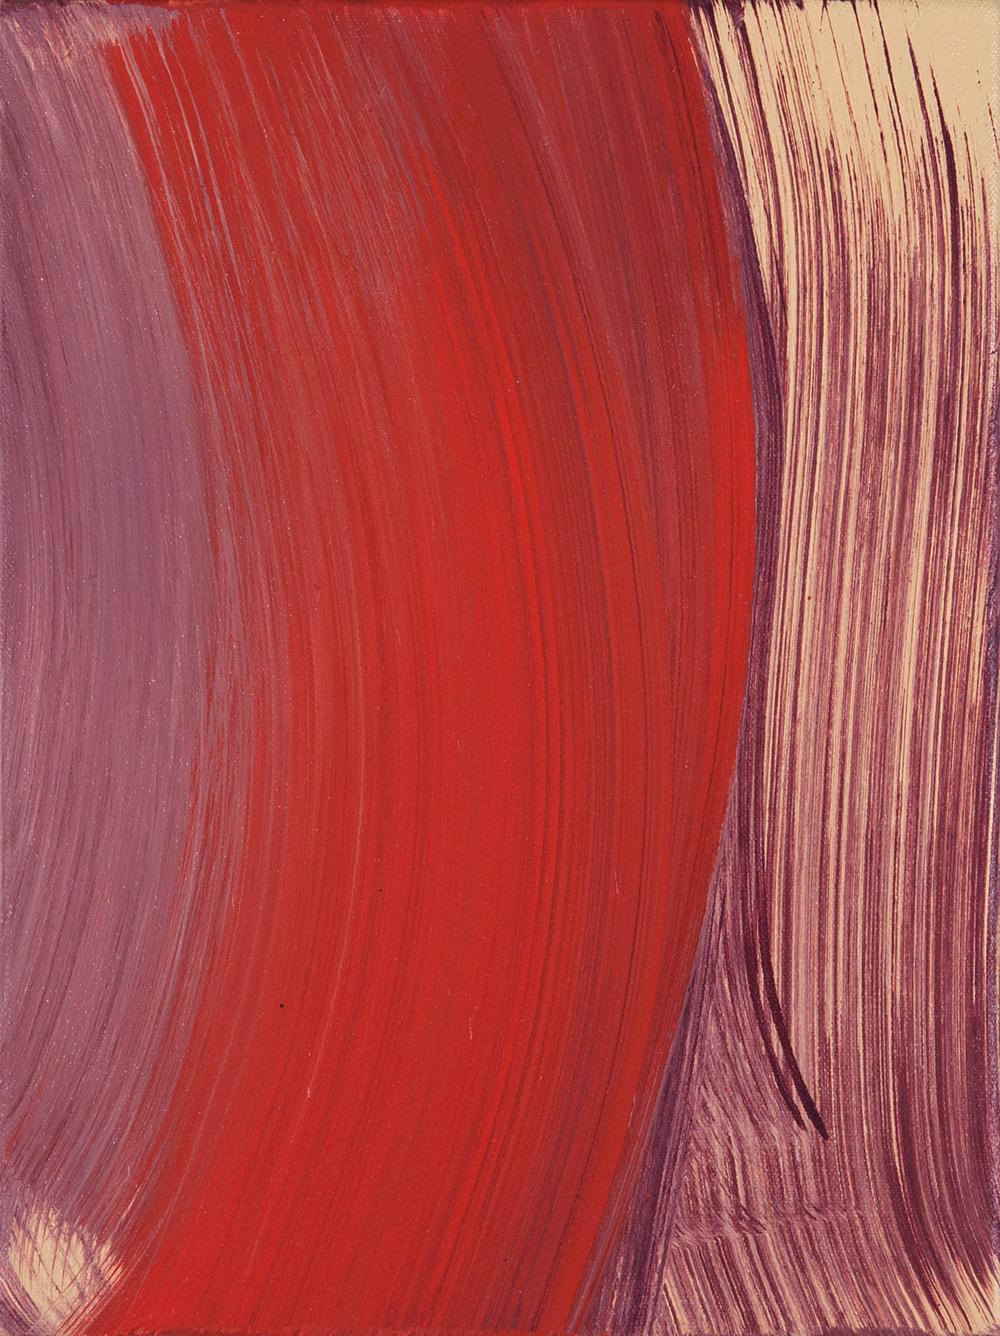 Red Swipe , 2014 oil on canvas 12 x 9 in.